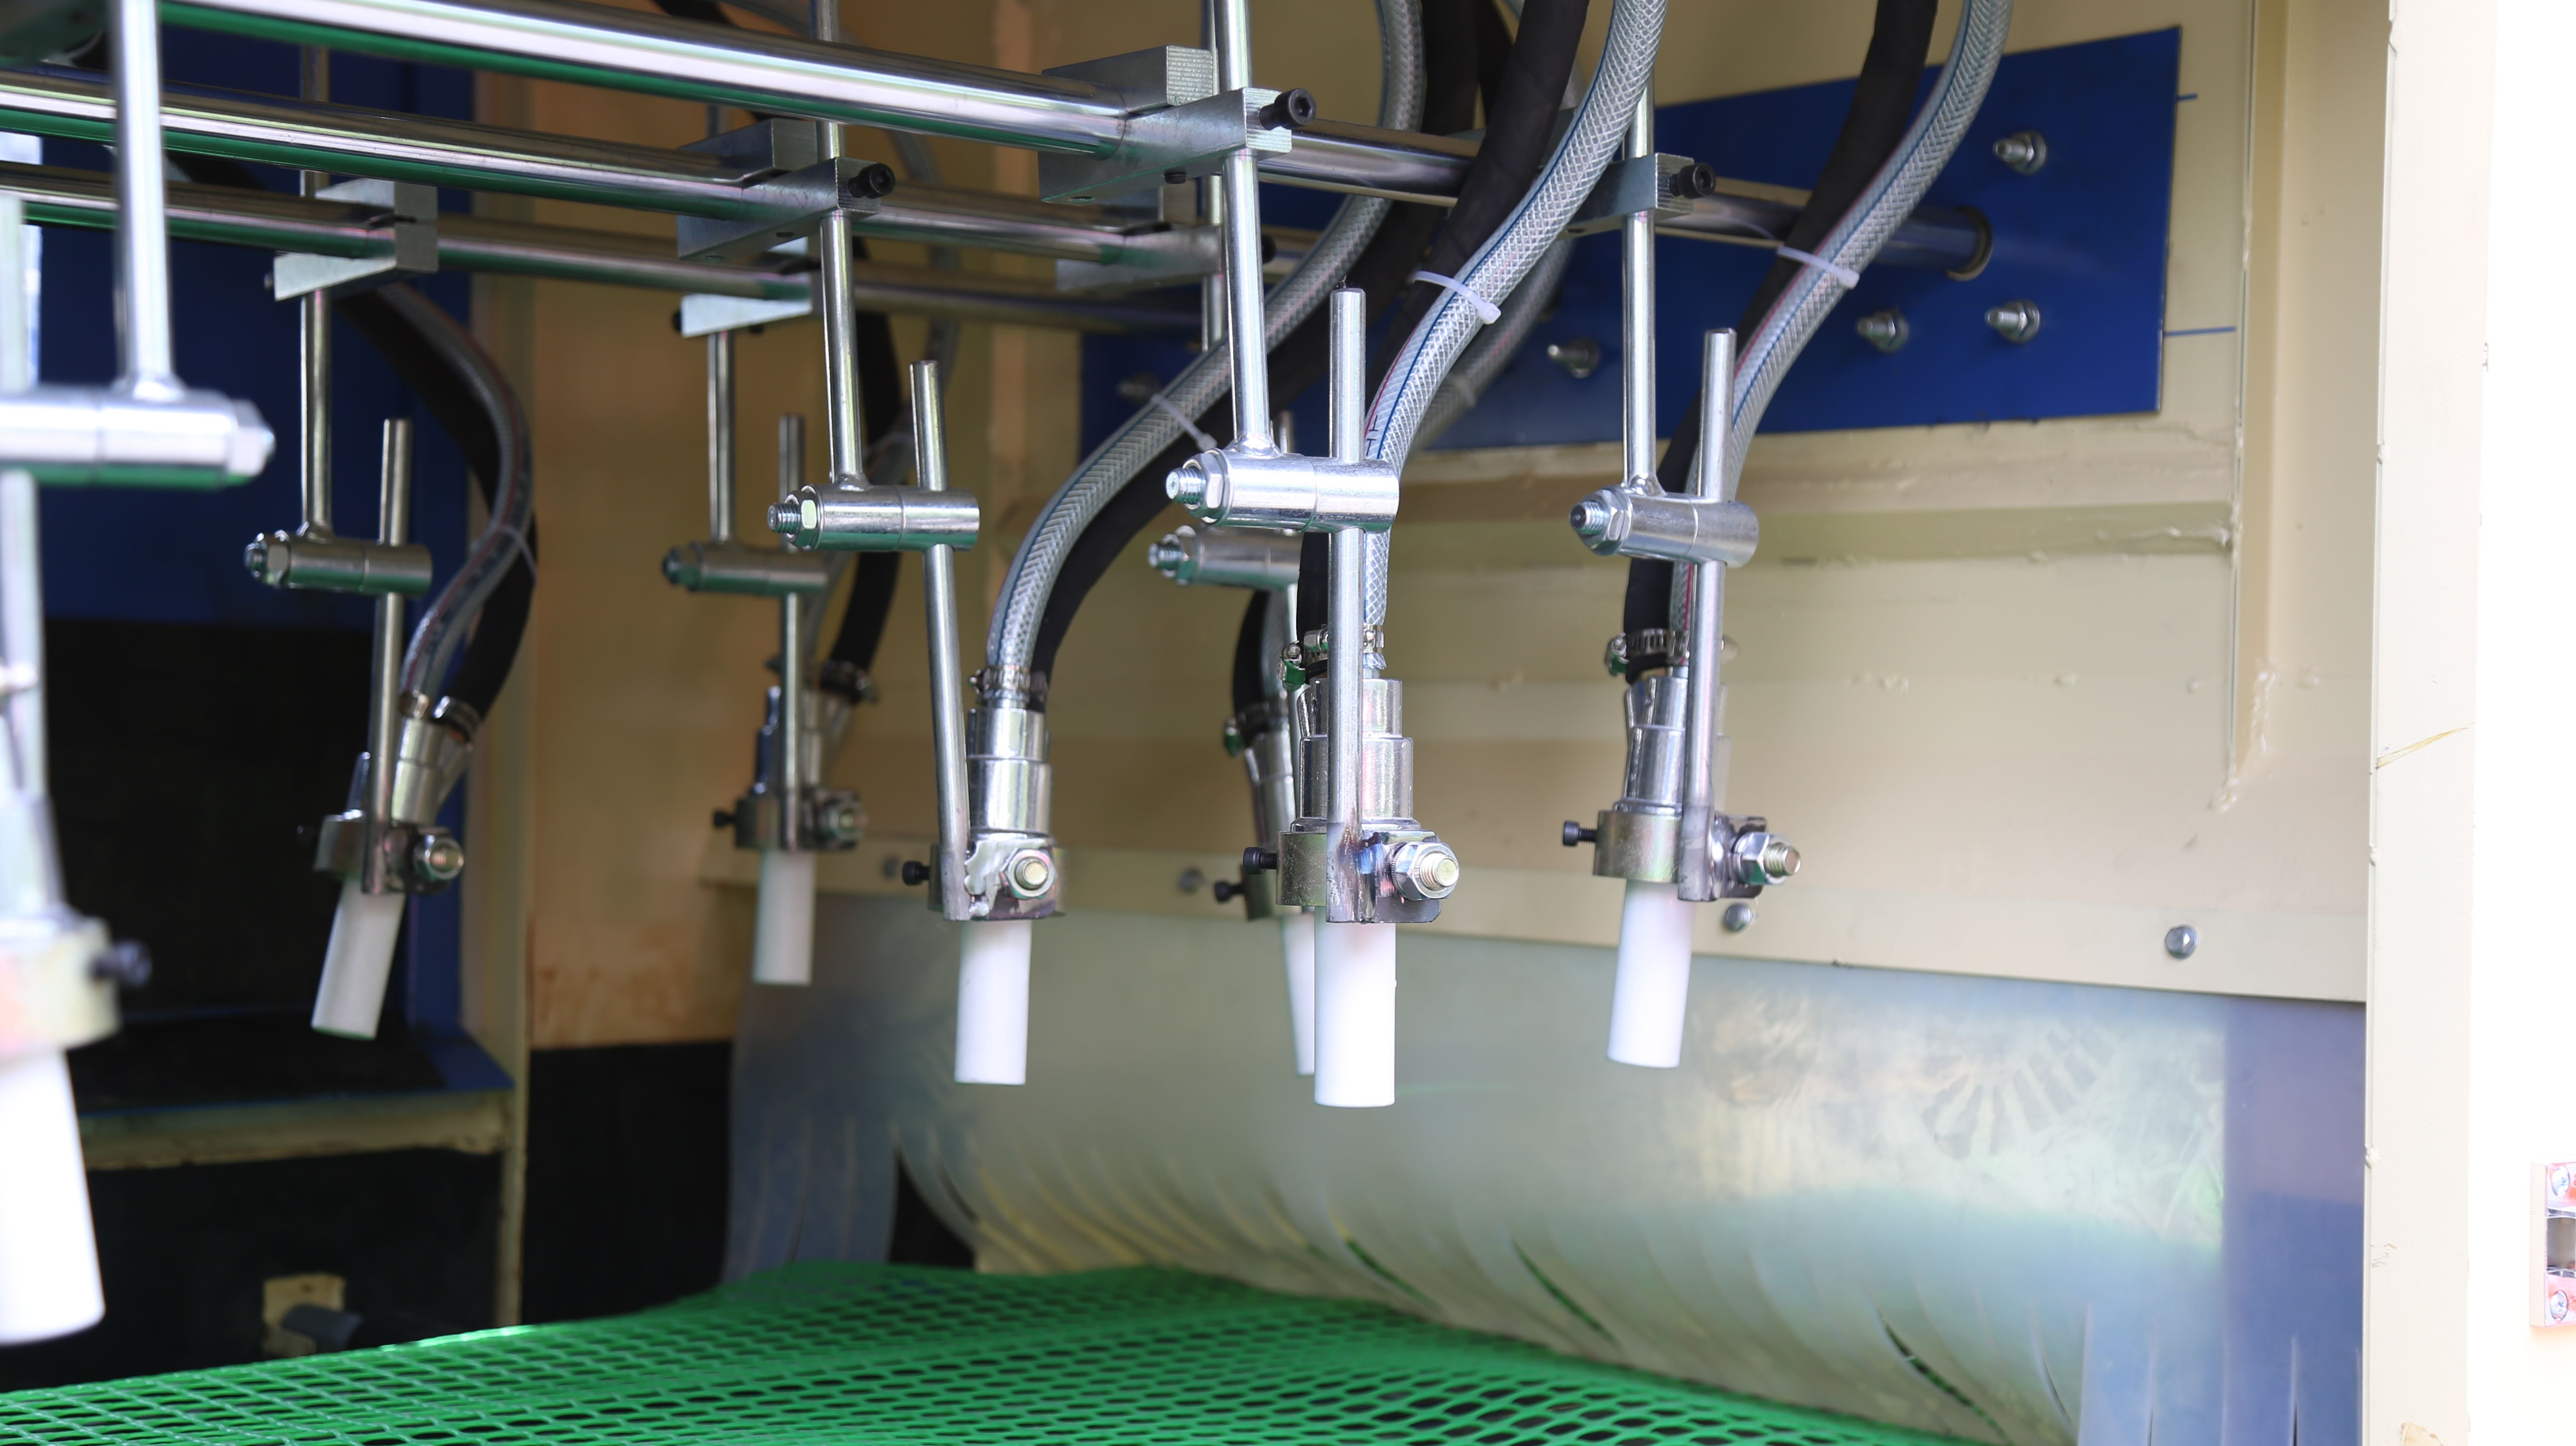 Conveyor belt blasting system has pcs of automatic gun for effective